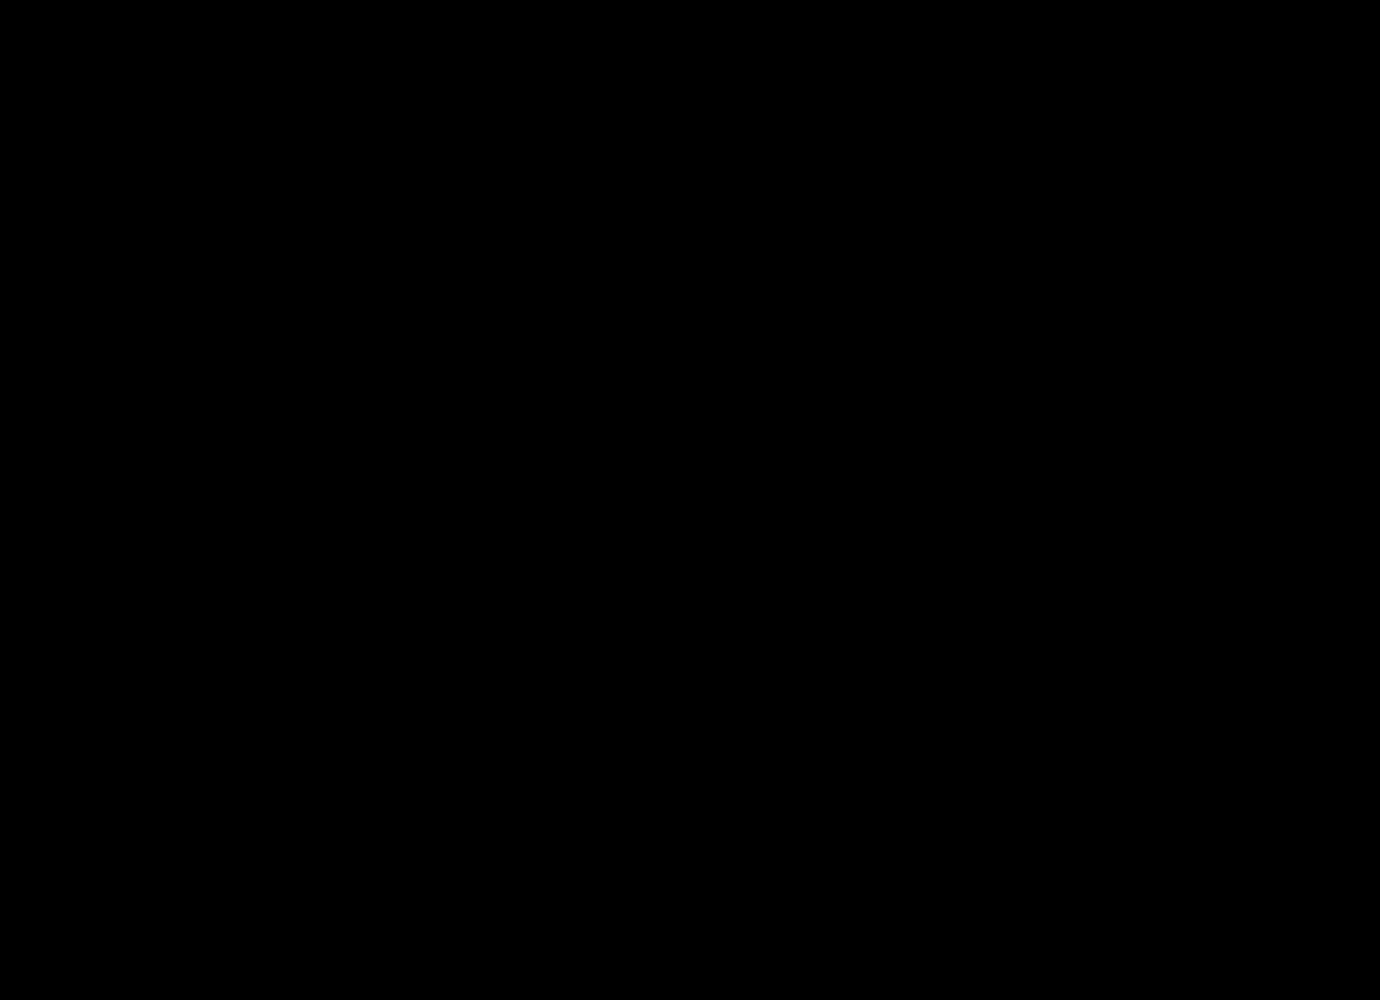 ALUMINUM SIGNAGESIGNAGE PRODUCT